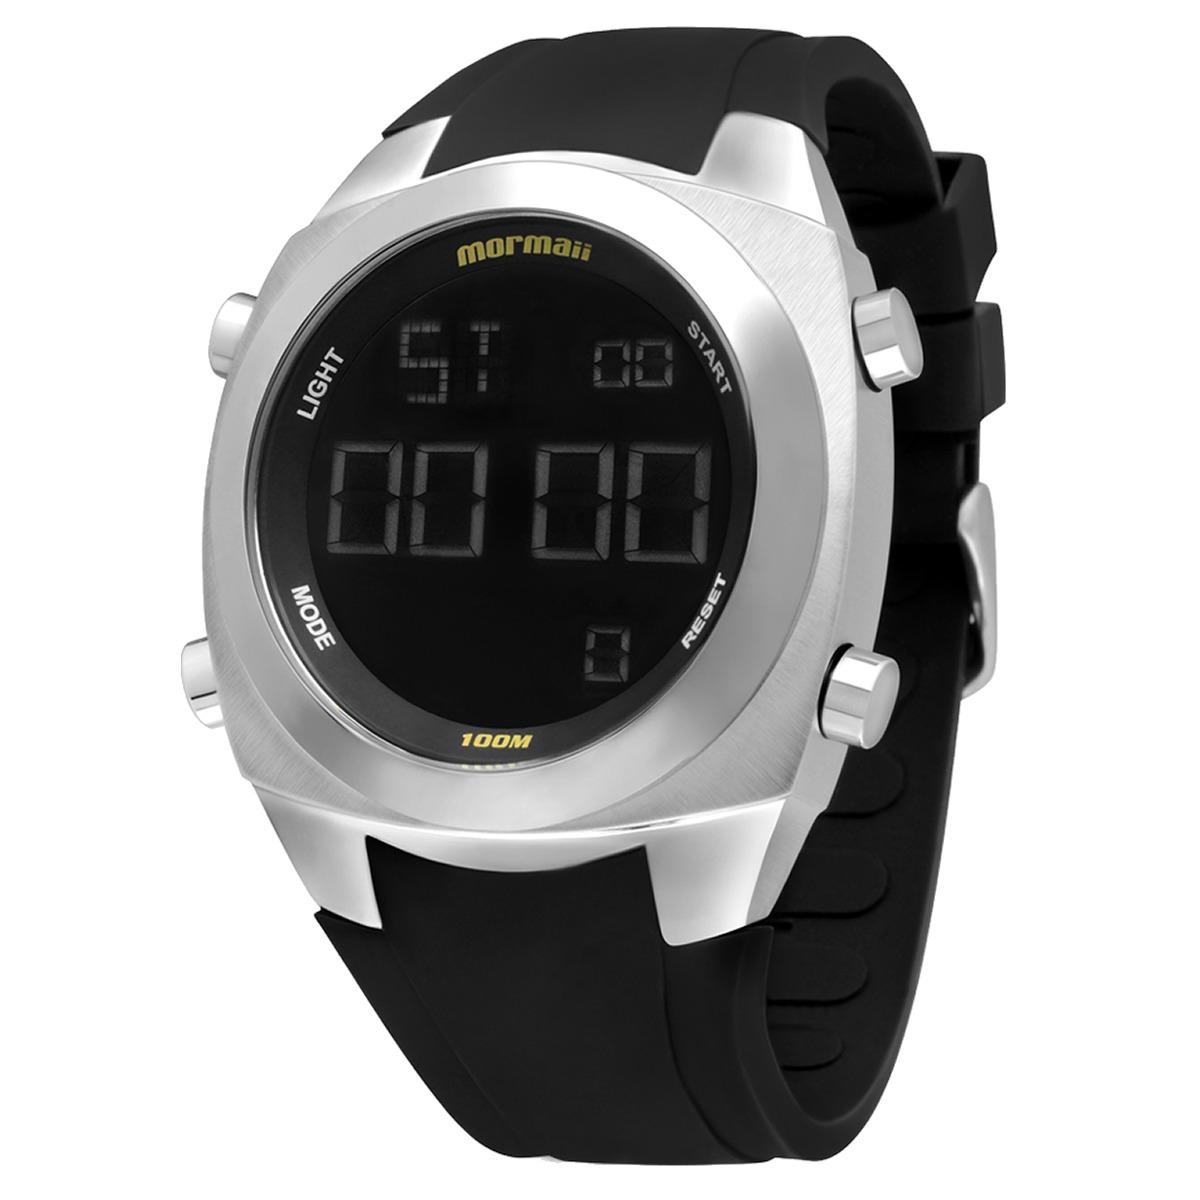 5c506c2f84c87 Relógio Masculino Sport Mormaii - Bj552aa 8y - R  219,99 em Mercado ...